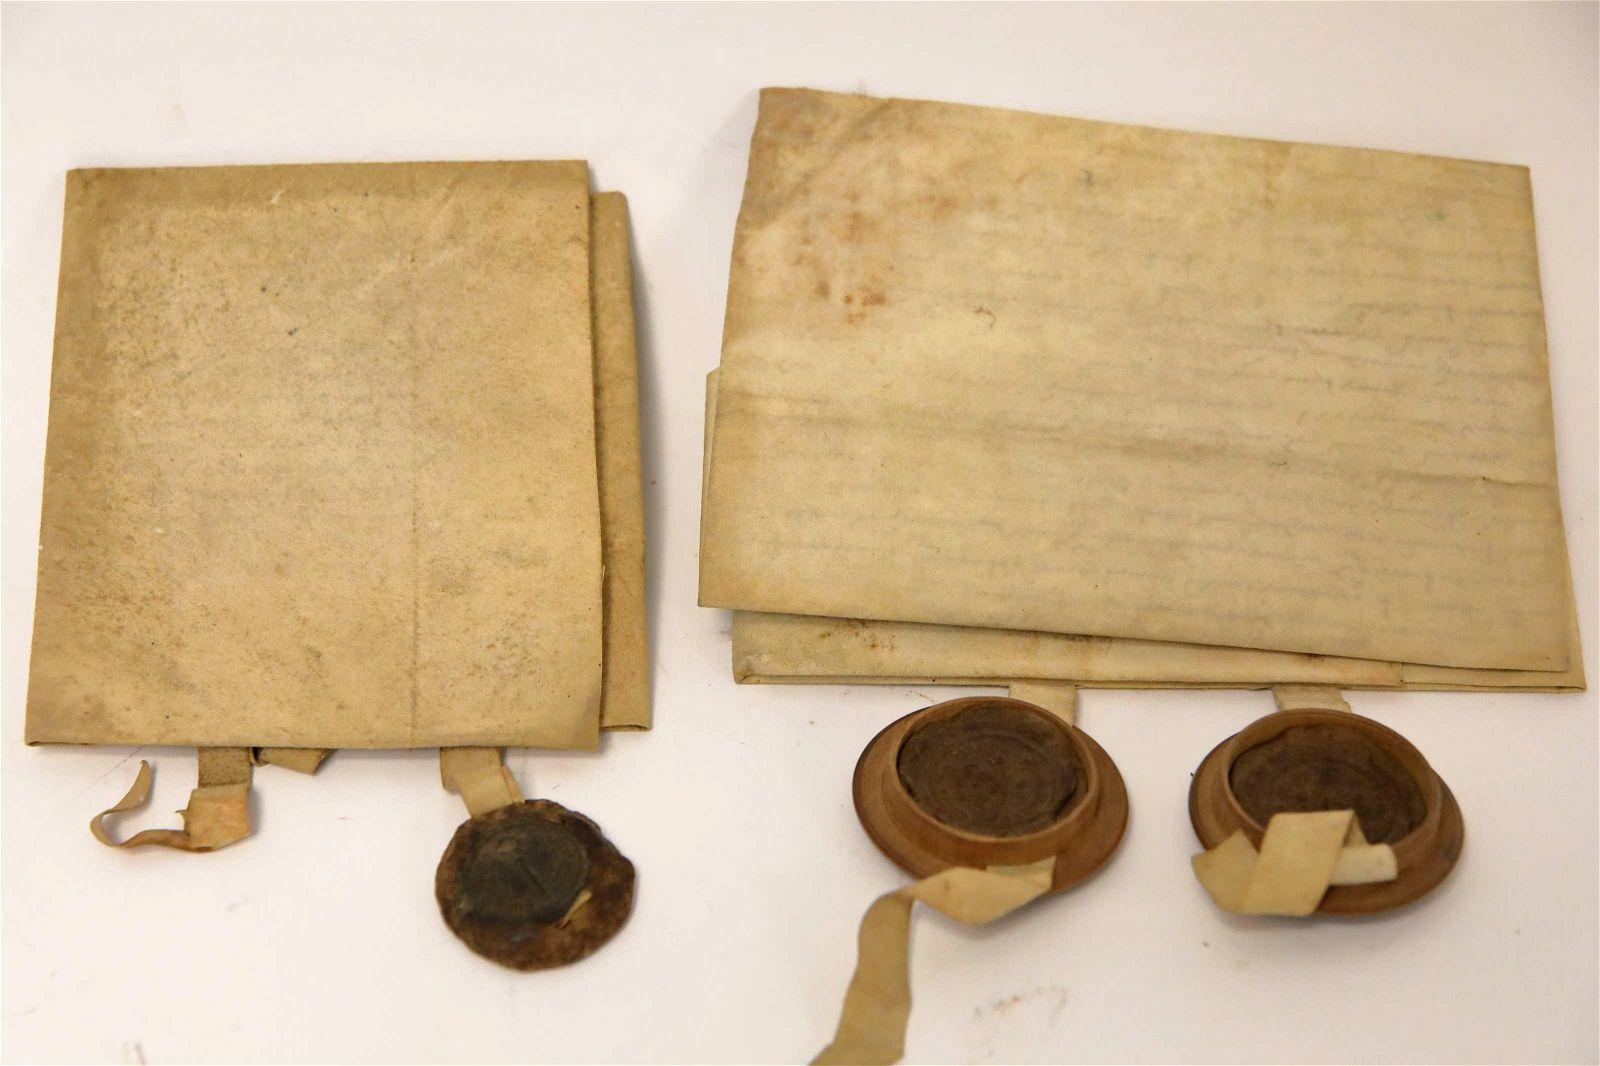 (2) 16th Century Documents Pen & Ink on Vellum